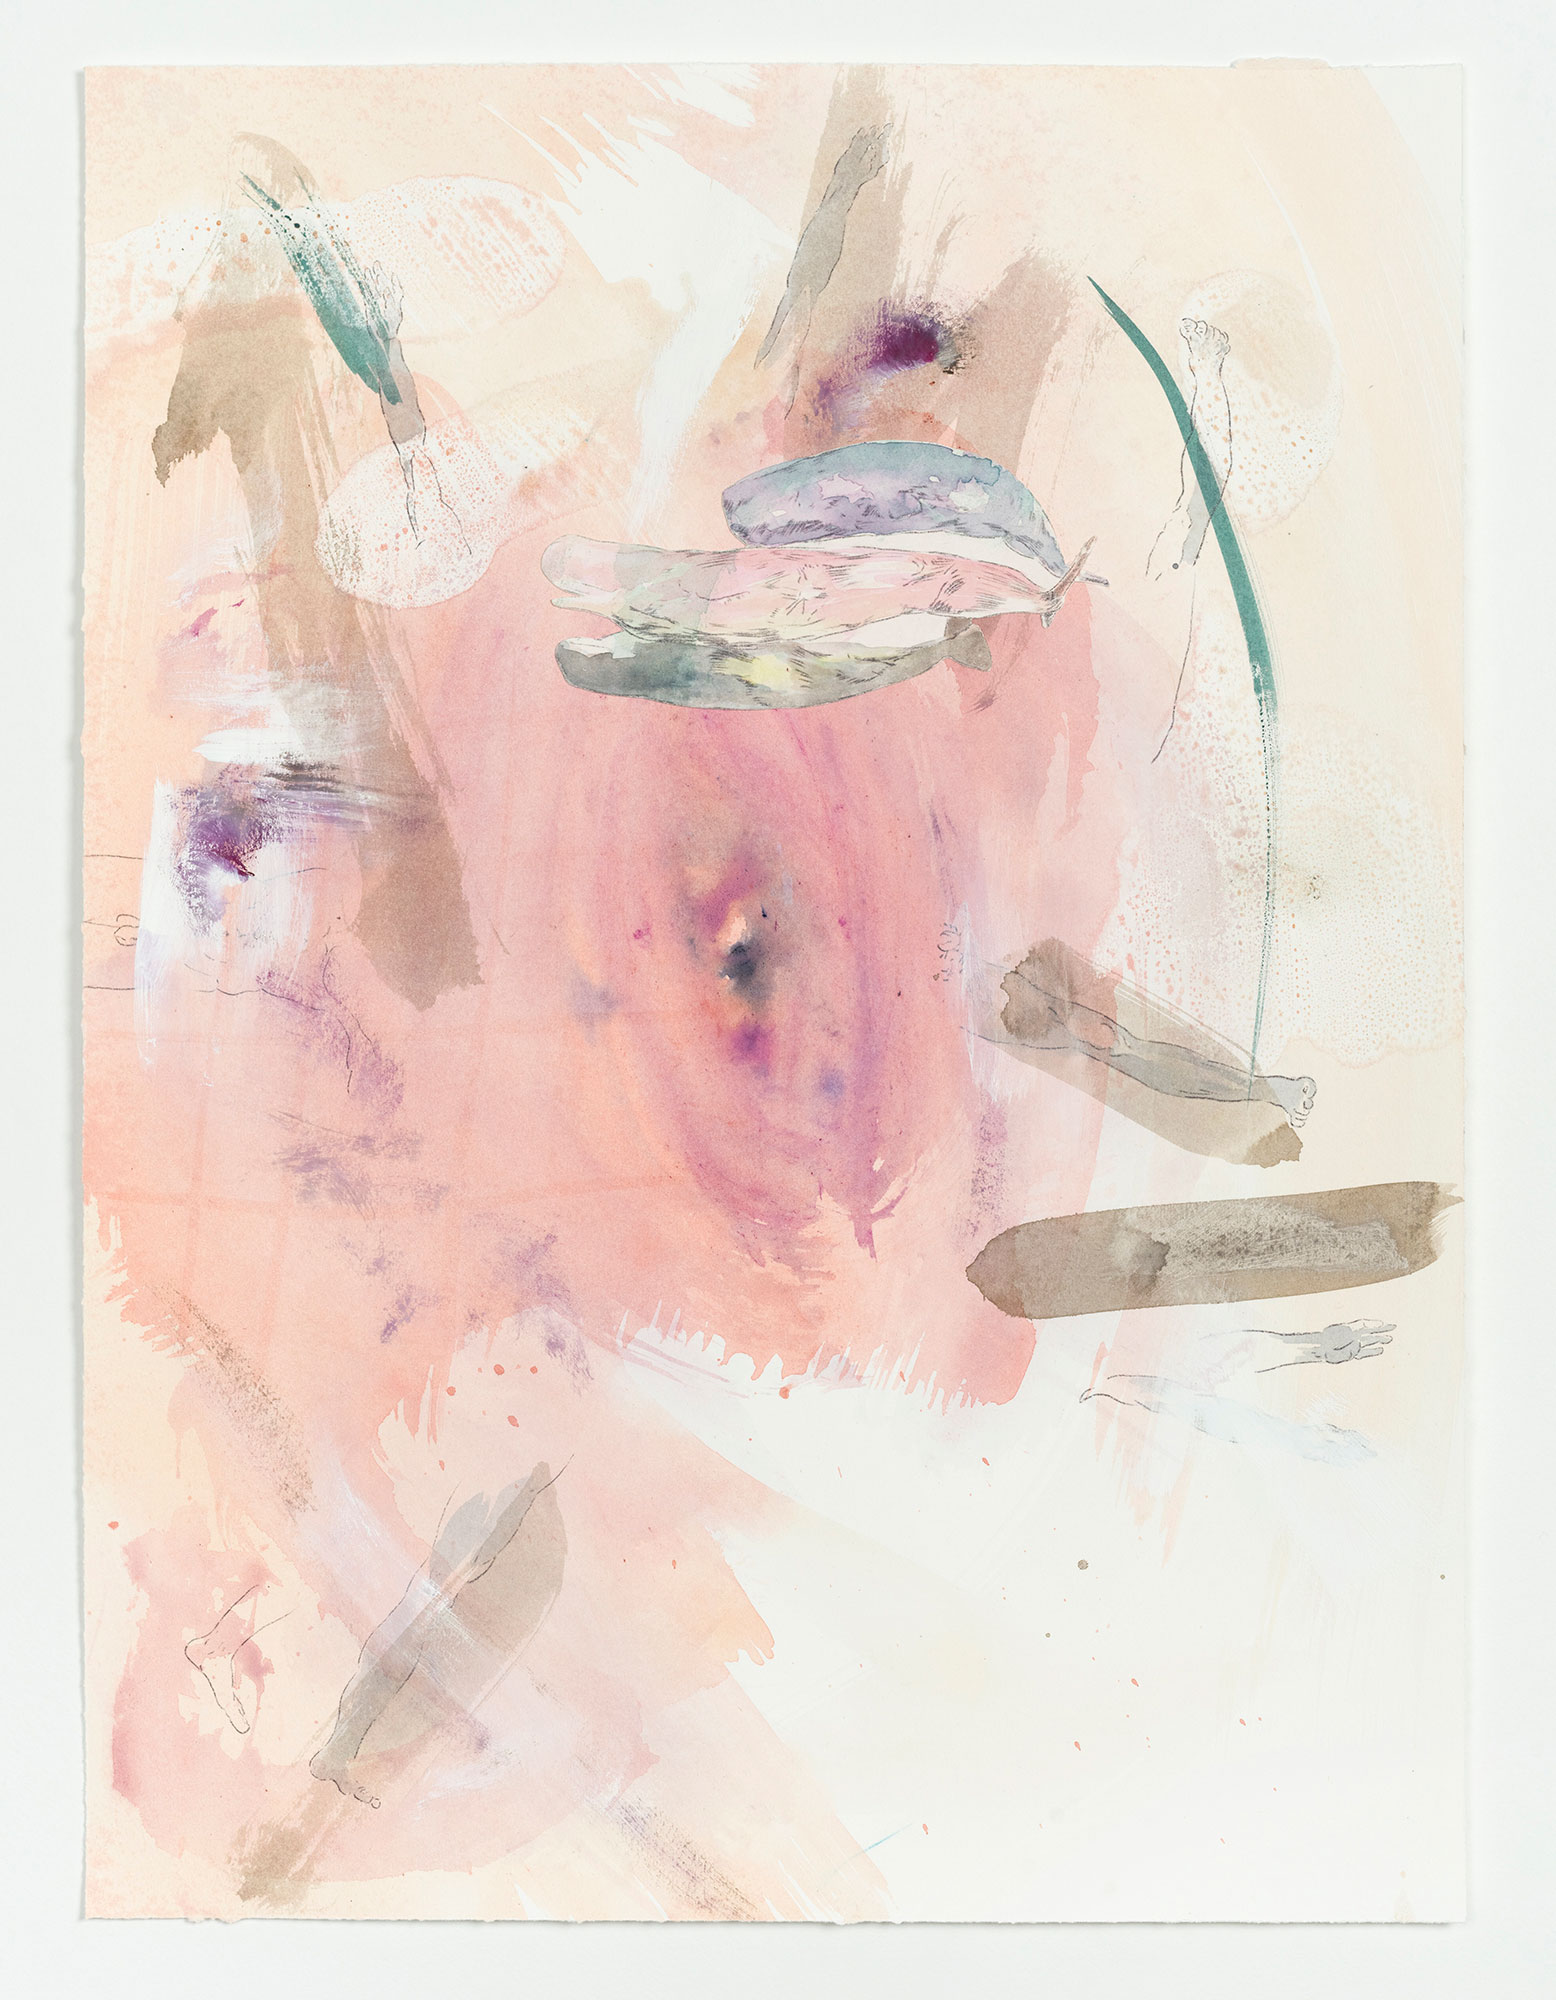 Kim Nekarda: untitled, 2020, watercolour, gouache, ink, carbon & body print on paper, 56 x 42 cm